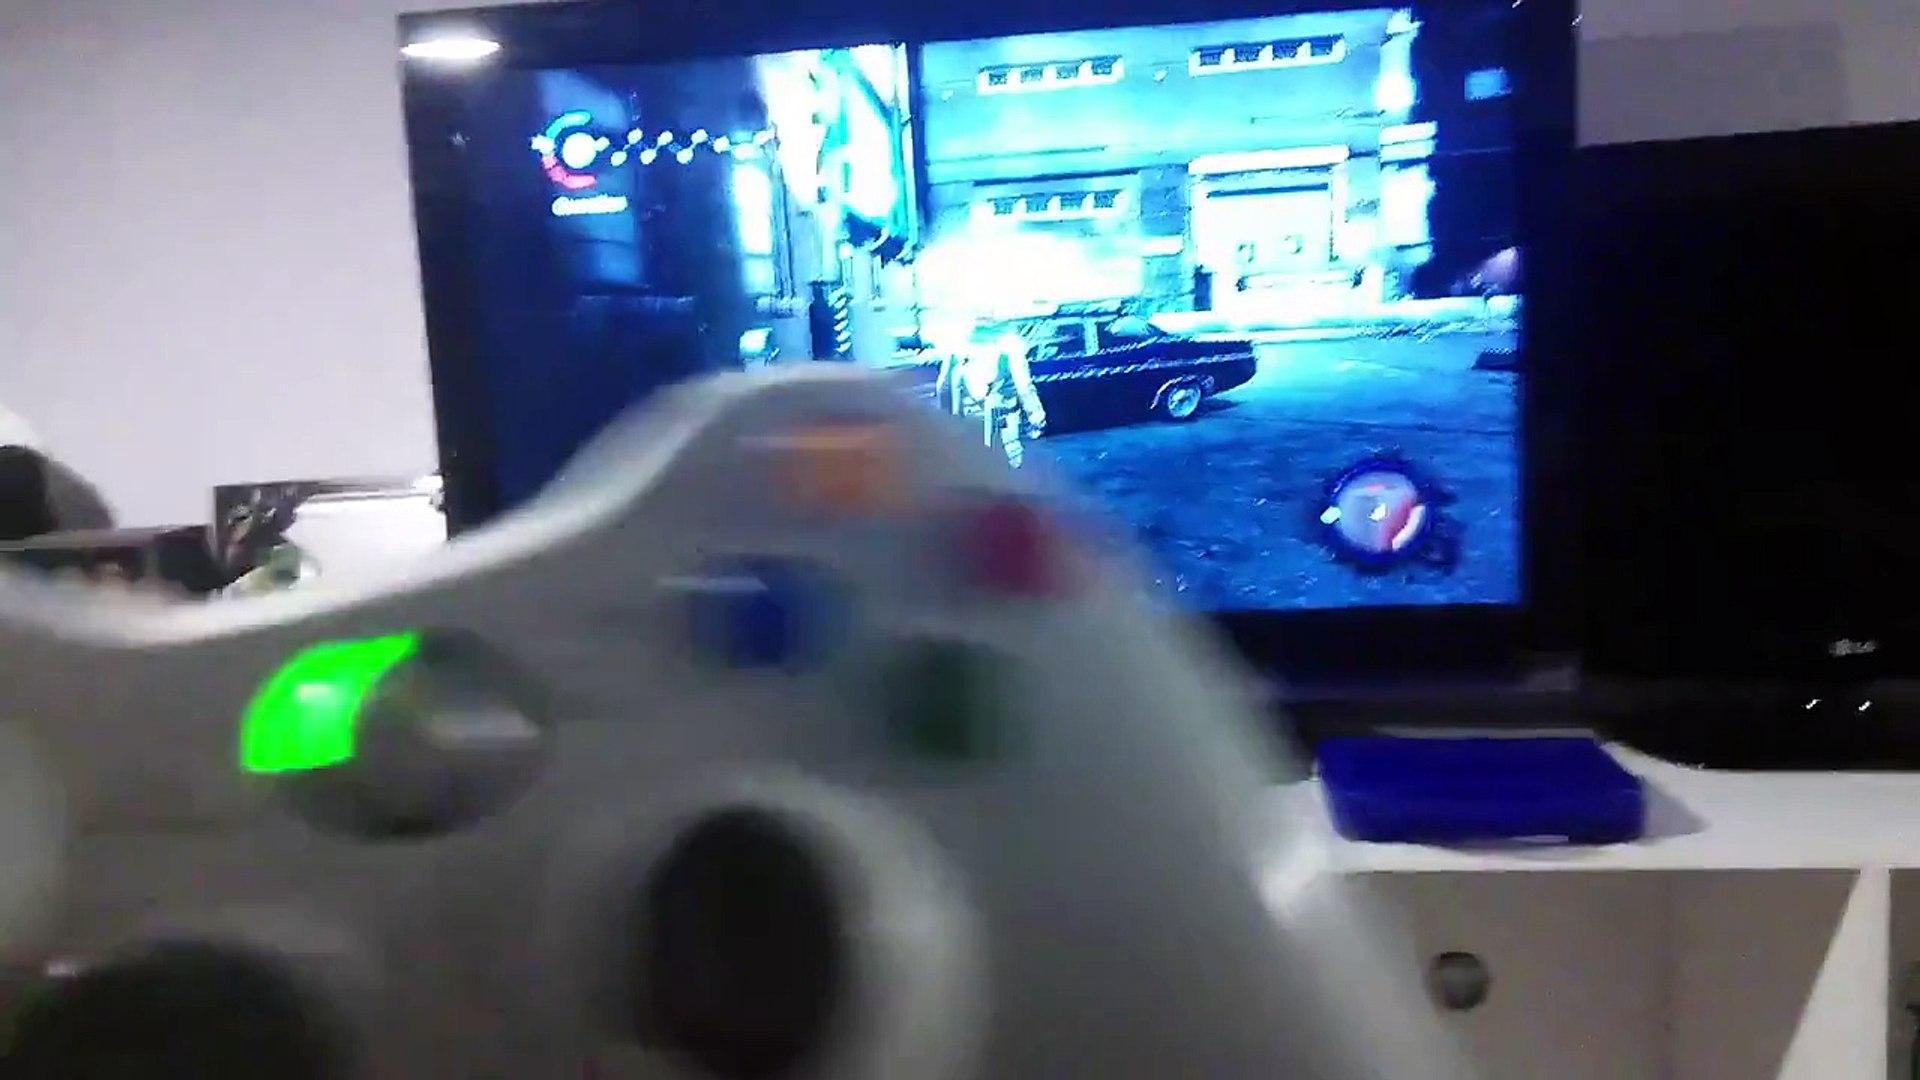 Cronus Max 360 controller on PS3